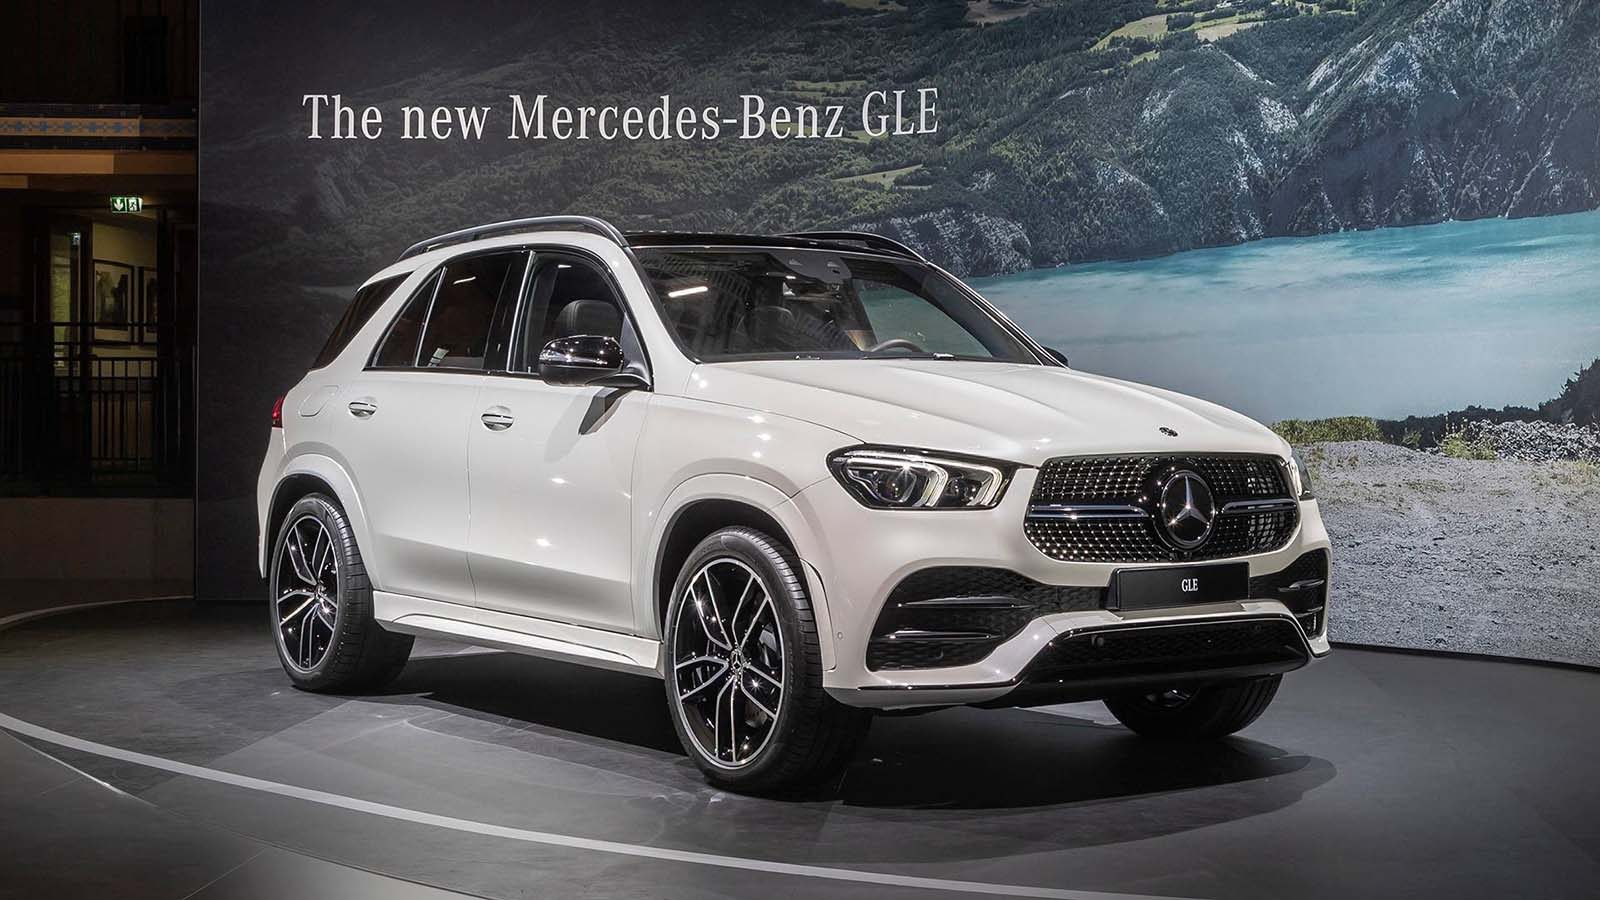 2018 Paris Motor Show: Mercedes GLE